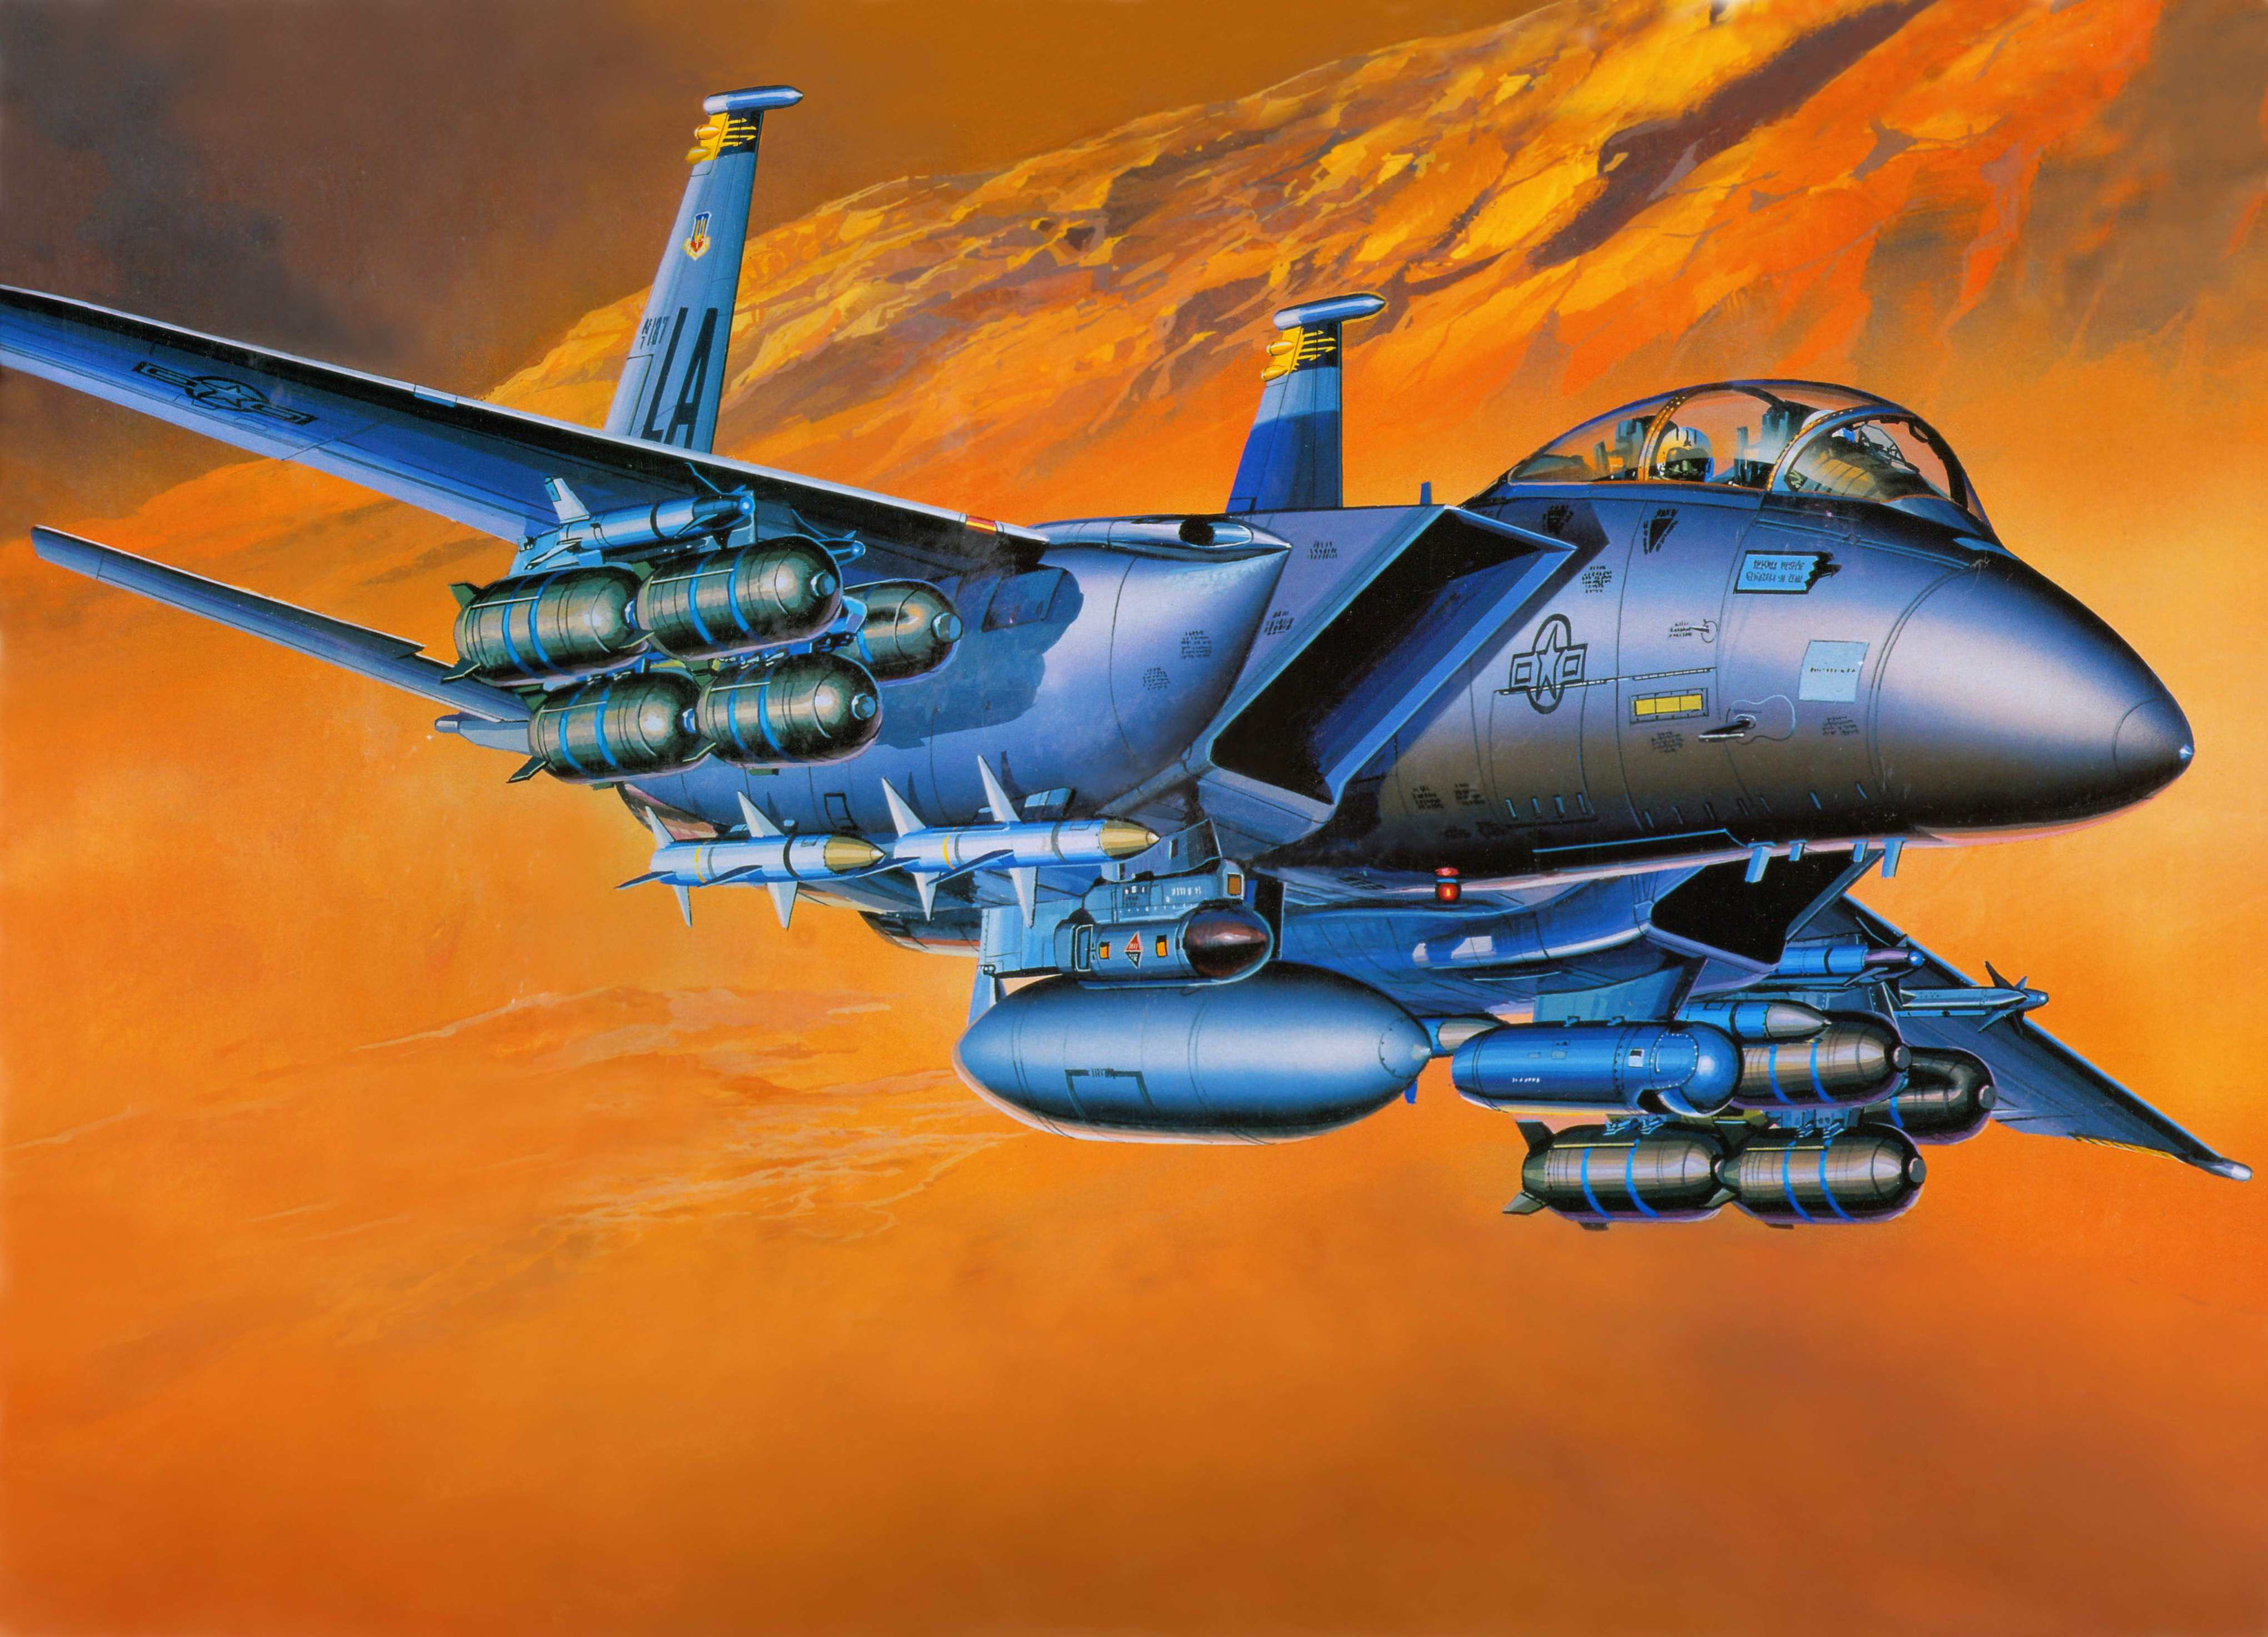 McDonnell Douglas F-15E Strike Eagle 4k Ultra HD Wallpaper ...